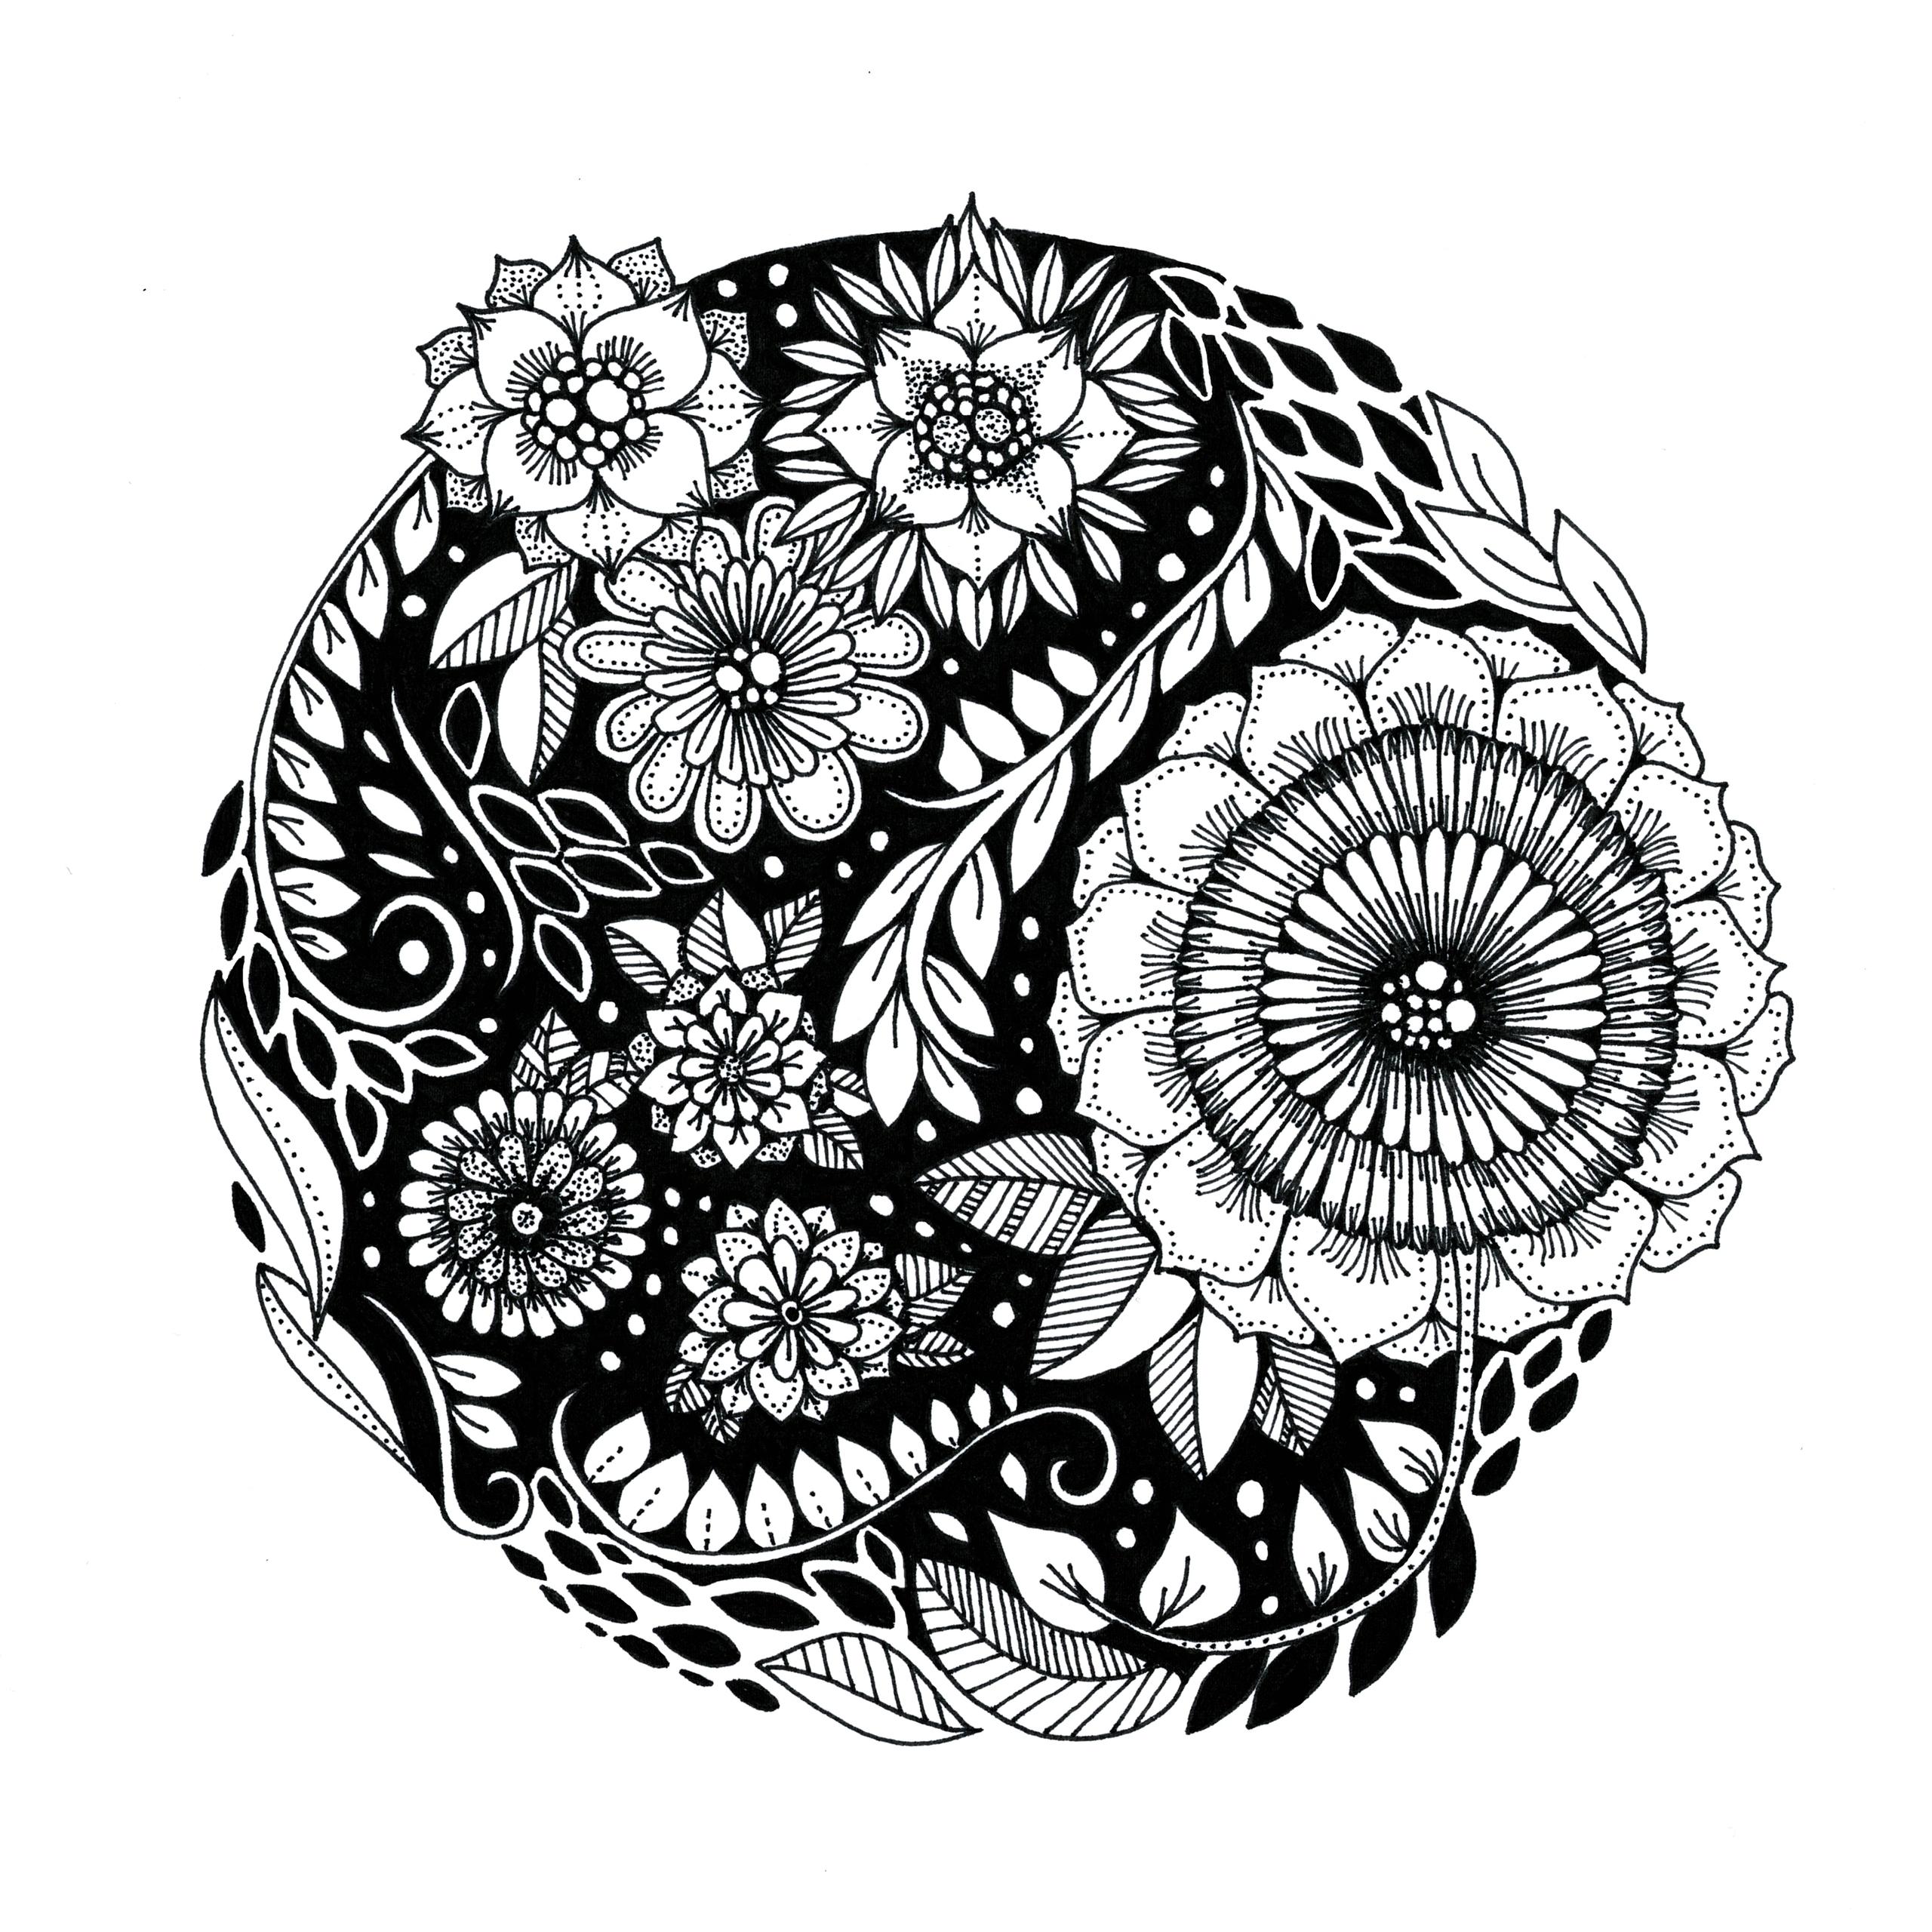 Black Floral - illustration, drawing - ellenparzer | ello